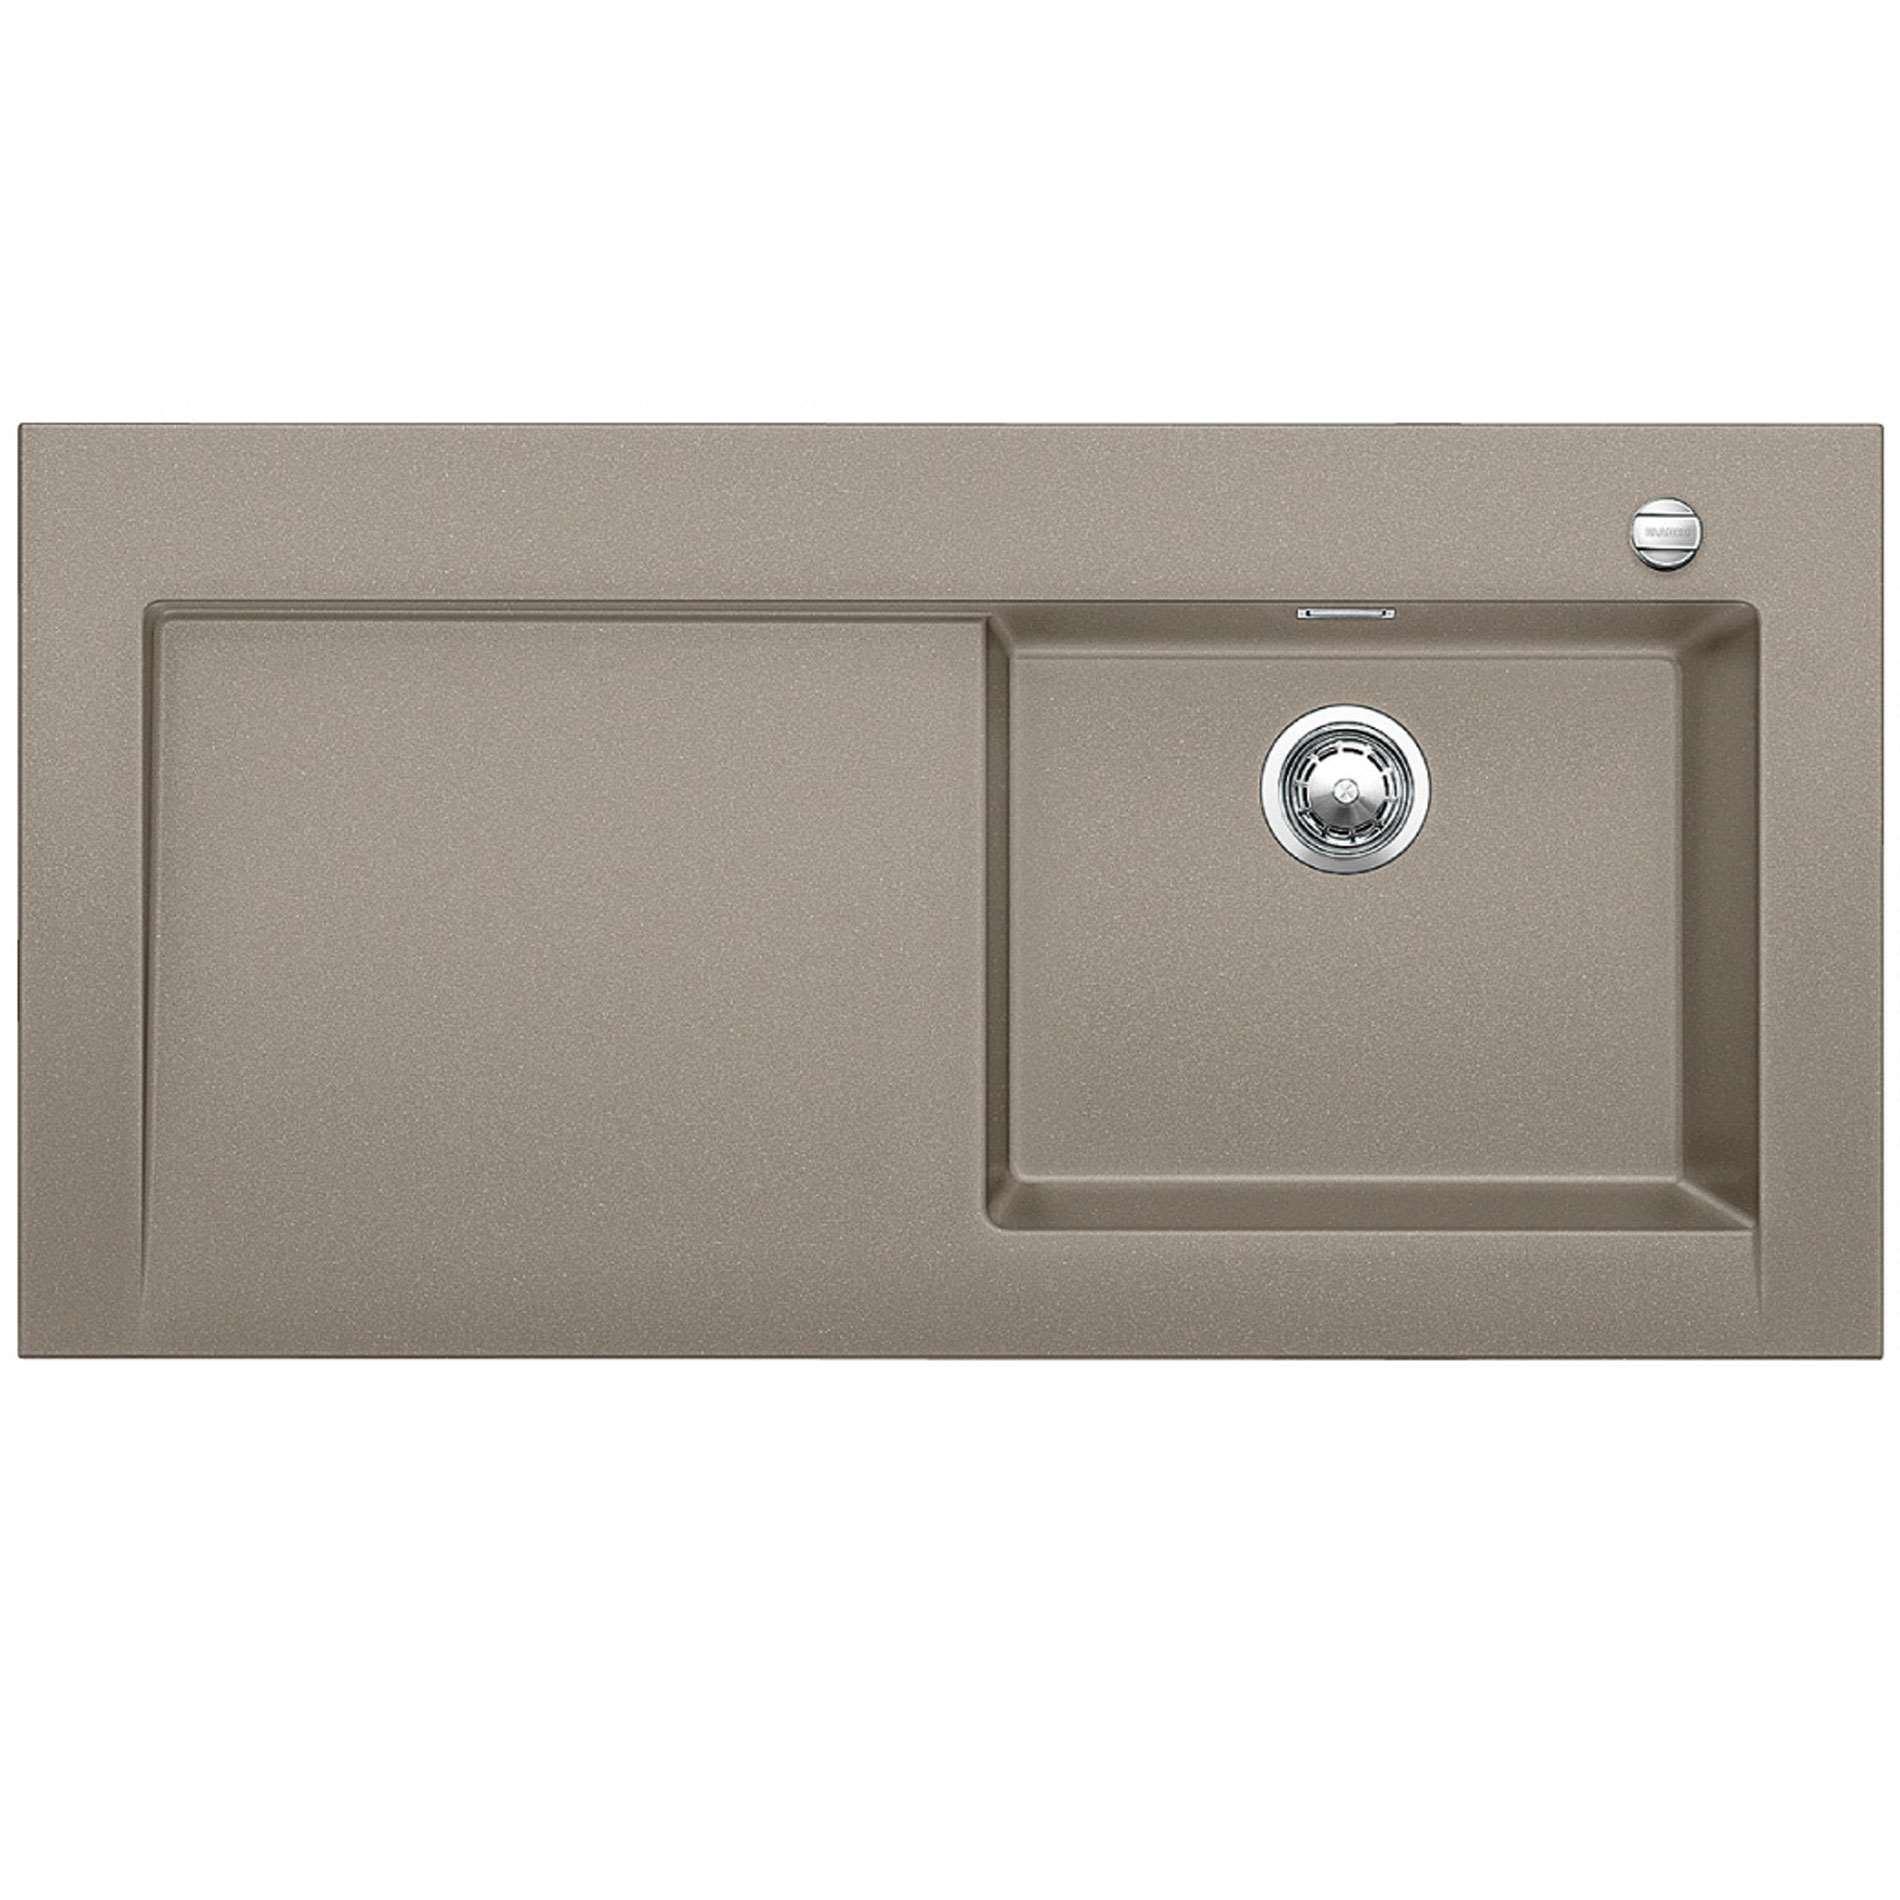 Blanco Sink Distributors : Blanco: Modex M-60 Tartufo Silgranit Sink - Kitchen Sinks & Taps